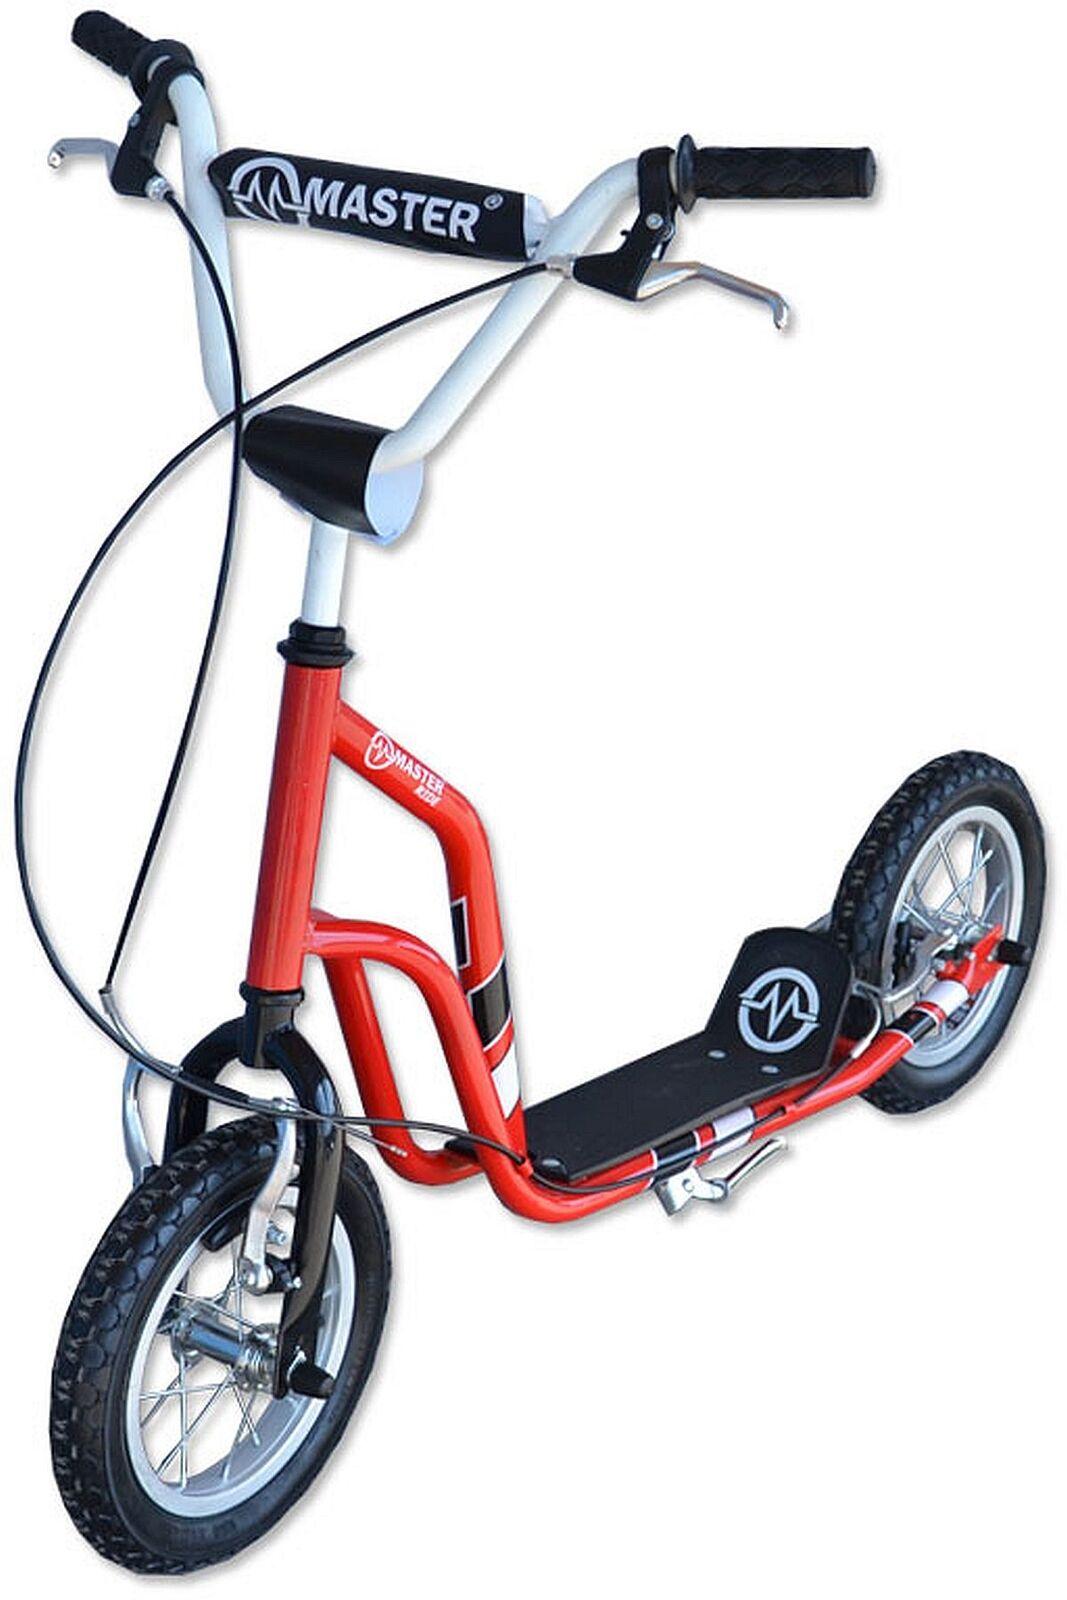 Tretroller Kinderroller Master Ride 12 Zoll Scooter rot-schwarz B-Ware